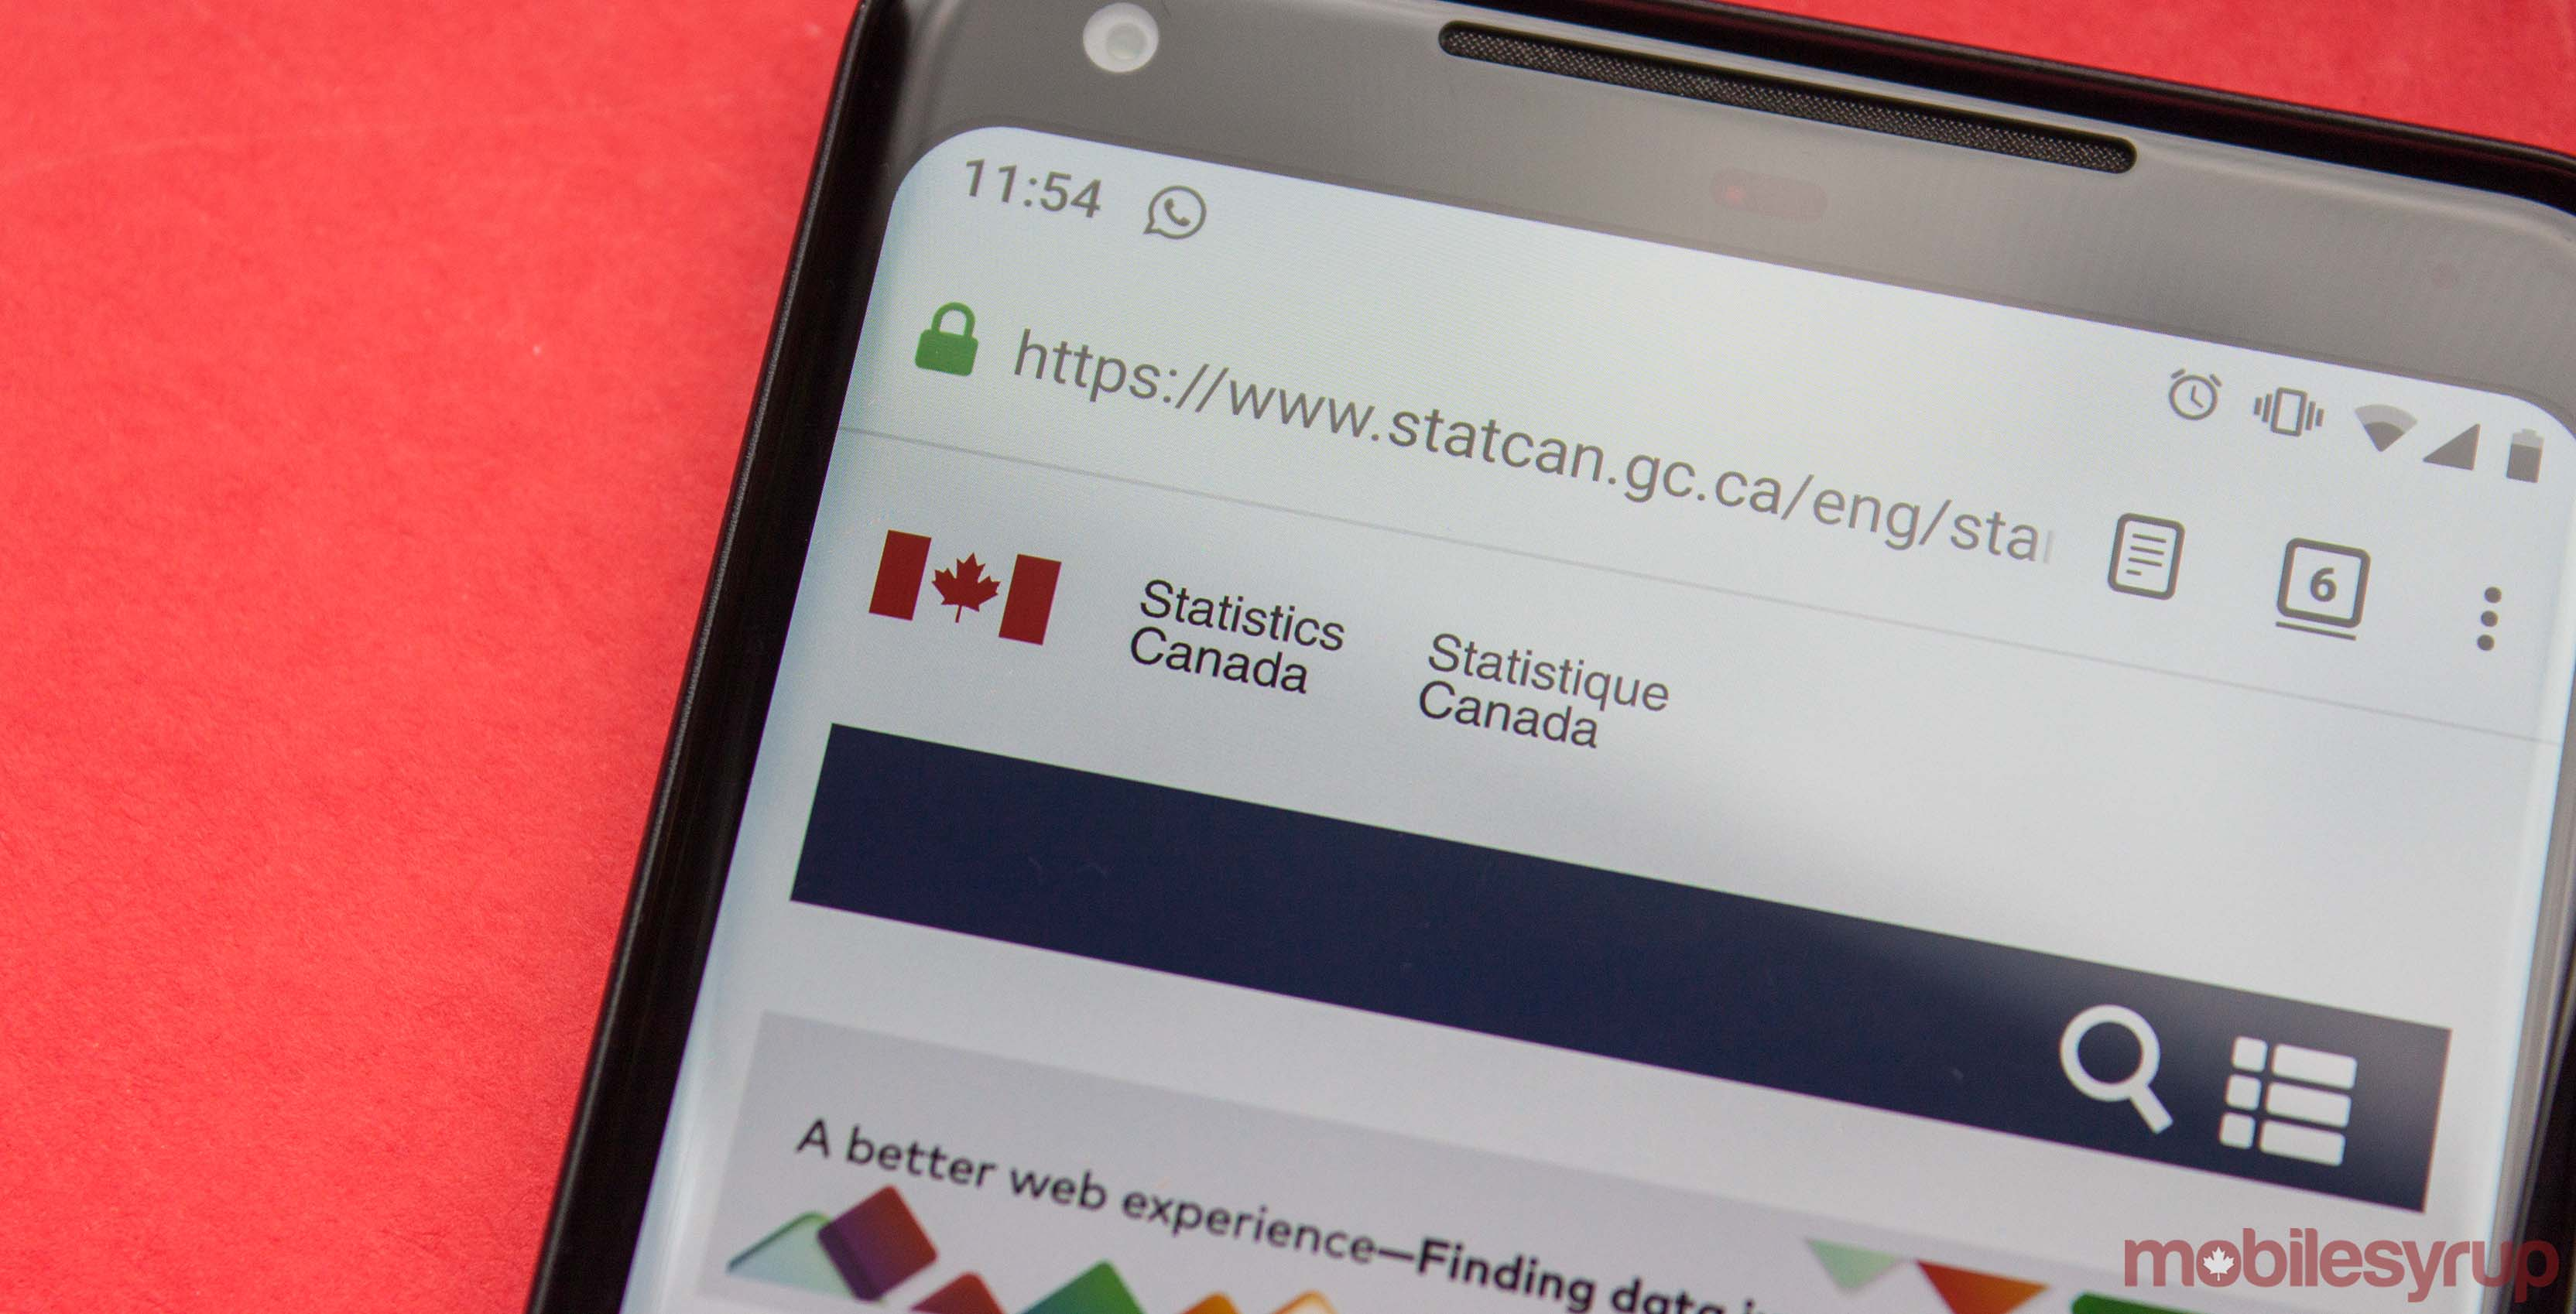 Statistics Canada website